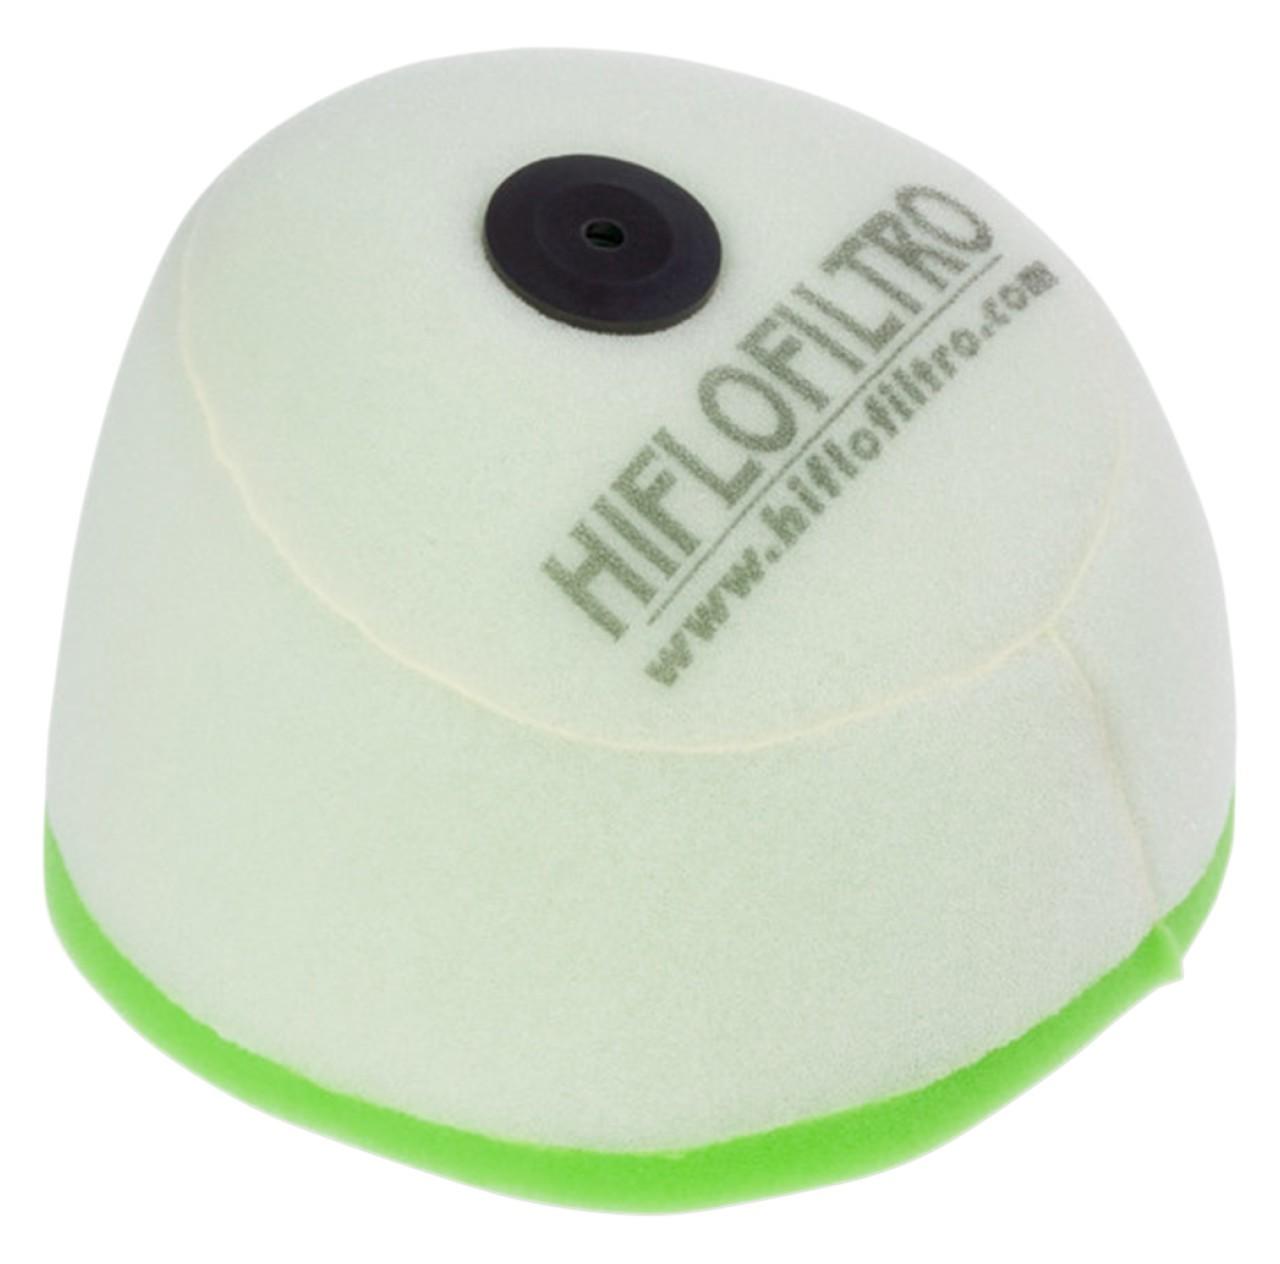 hiflofiltro air filter kawasaki klr650 1987-2016 | 10% ($1 99) off! -  revzilla